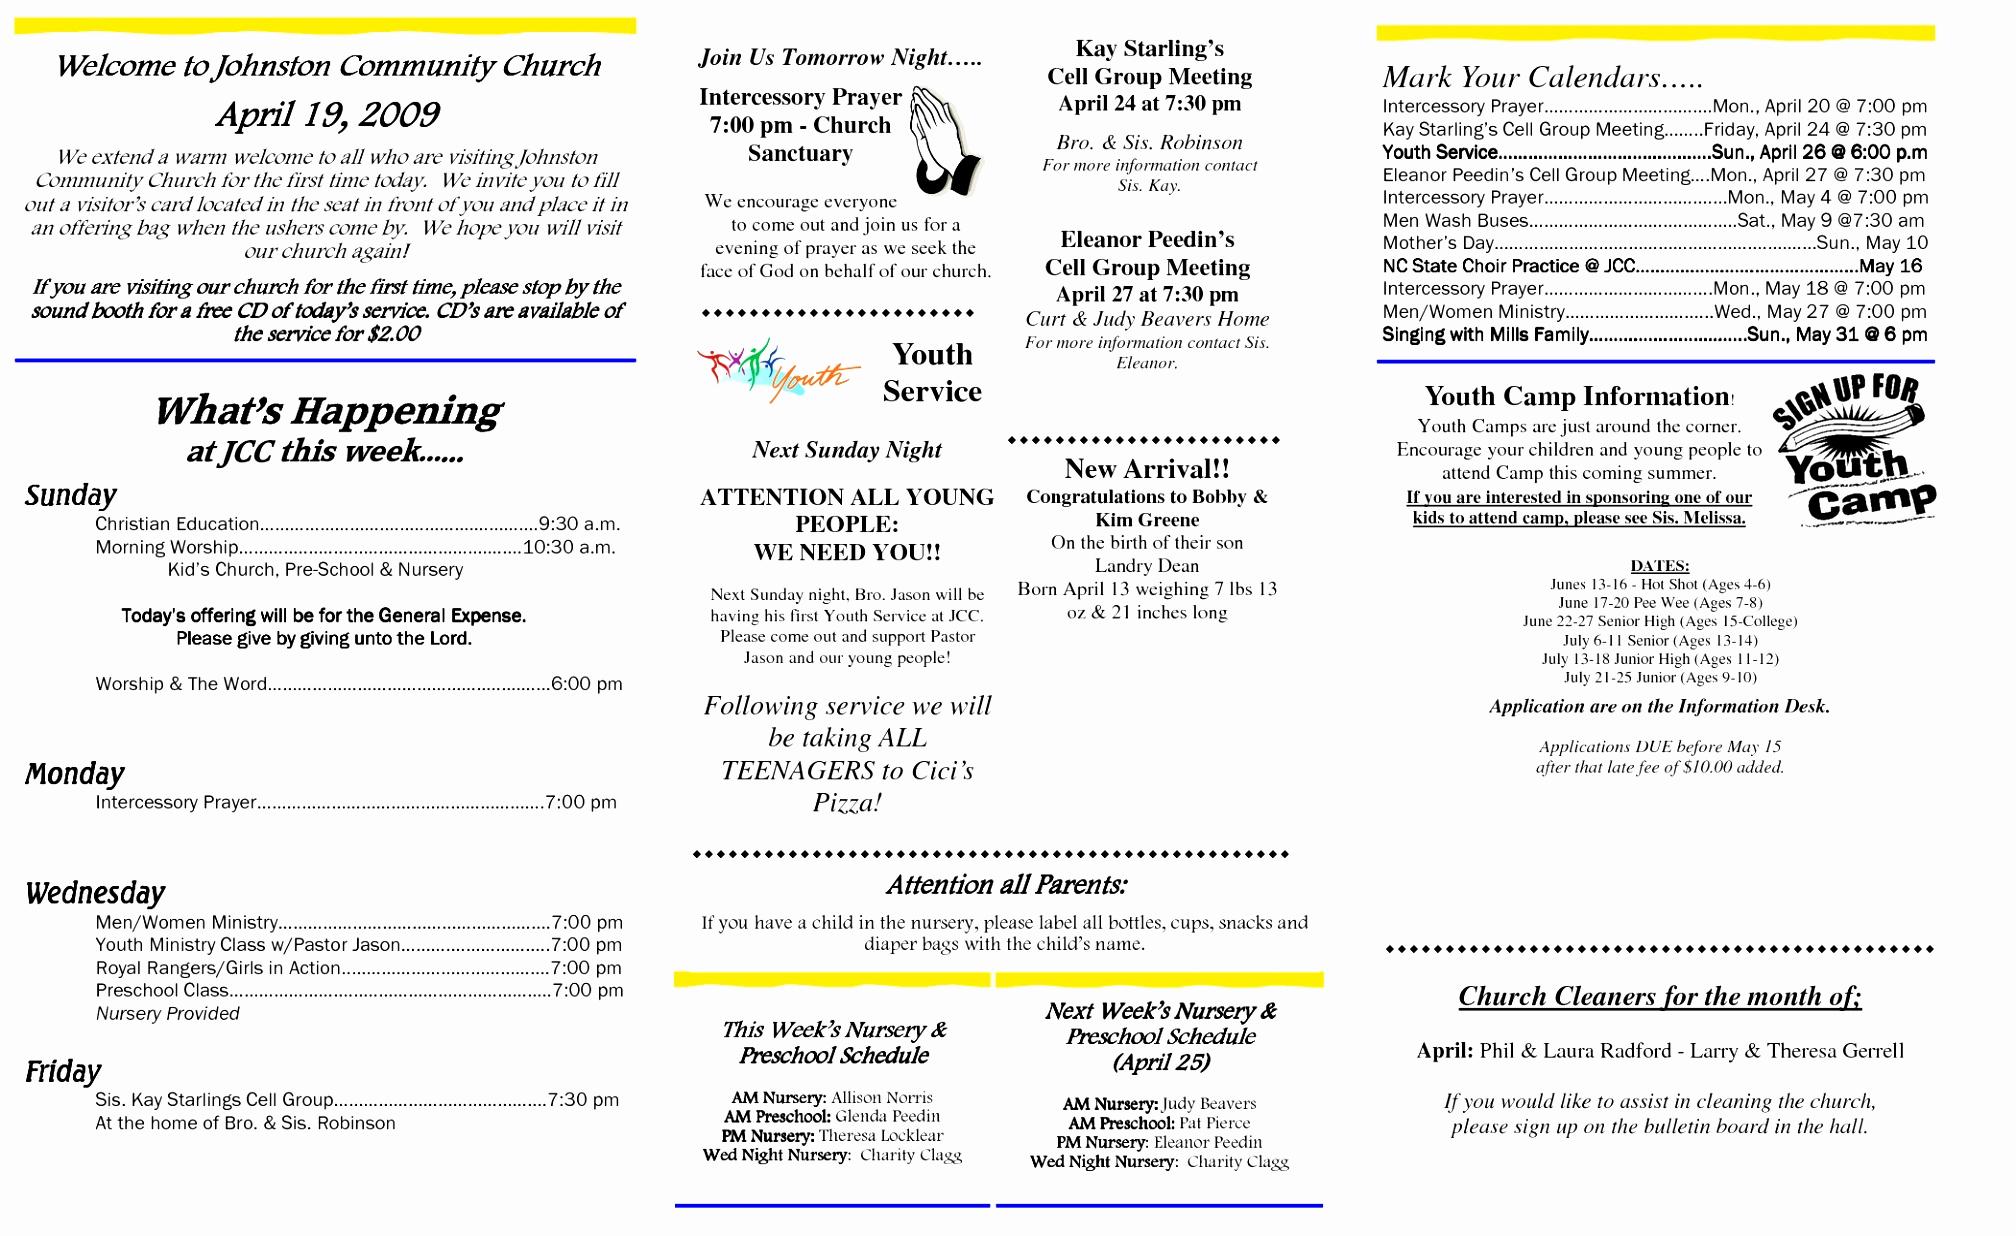 Free Church Bulletin Templates Elegant 12 Church Bulletin Template Microsoft Word Oinwy